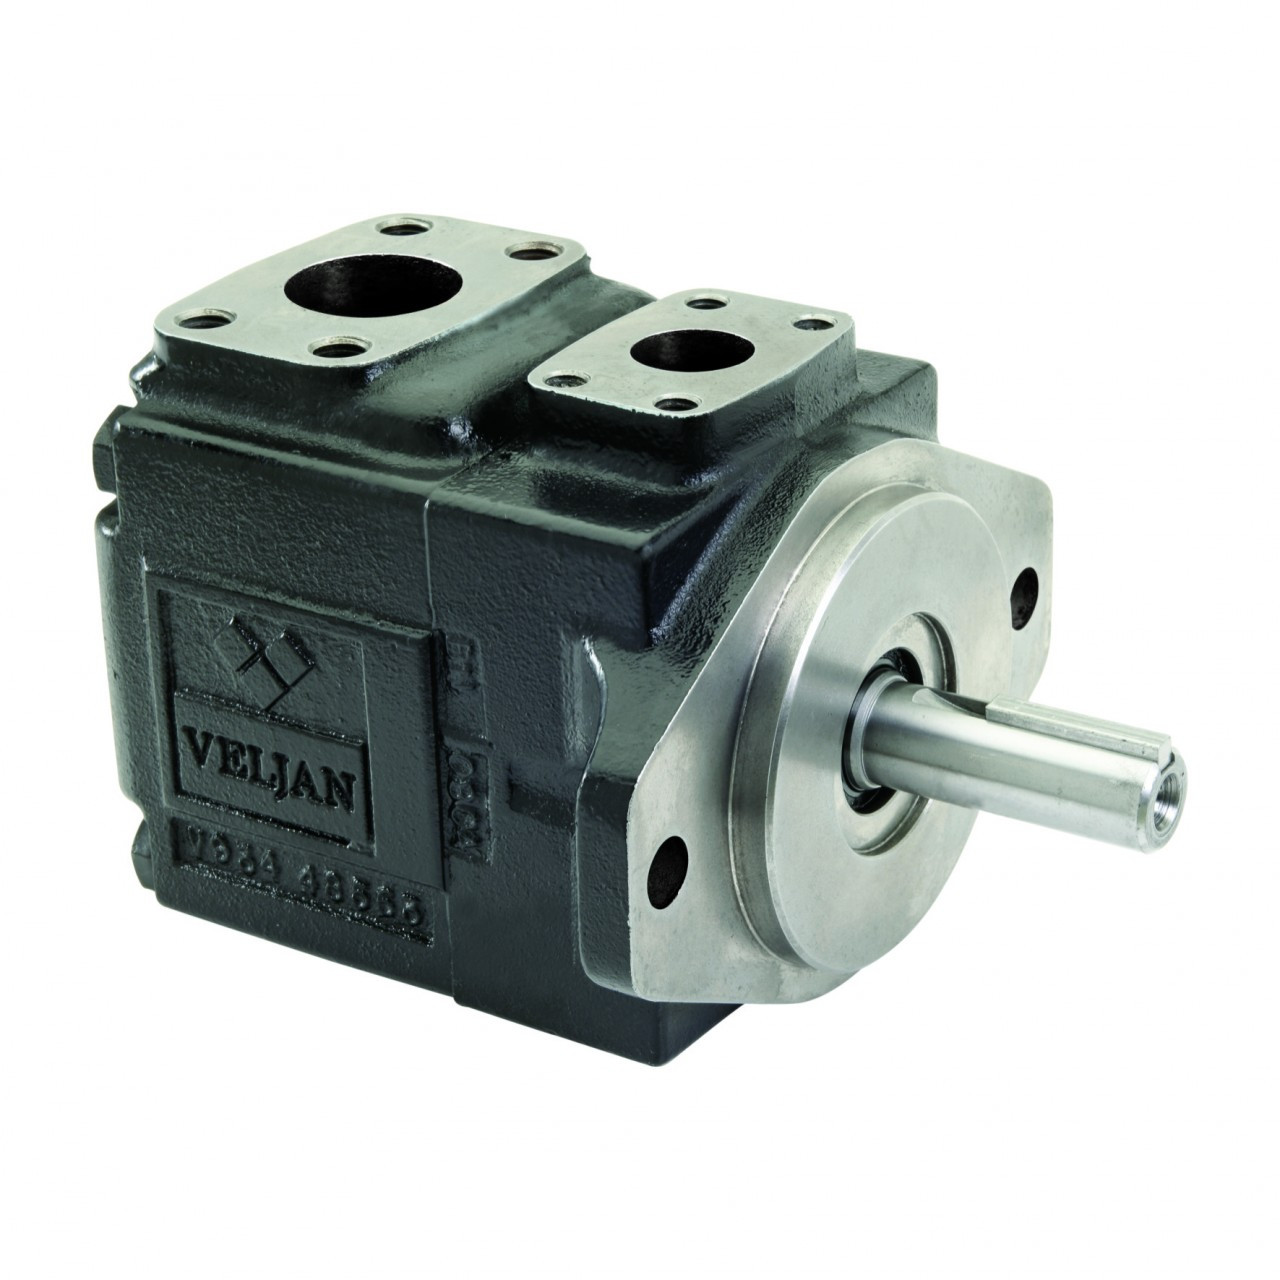 Veljan Single Vane Pump - VT6C - Rons Drivelines | Drivelines | Driveshafts | Differentials